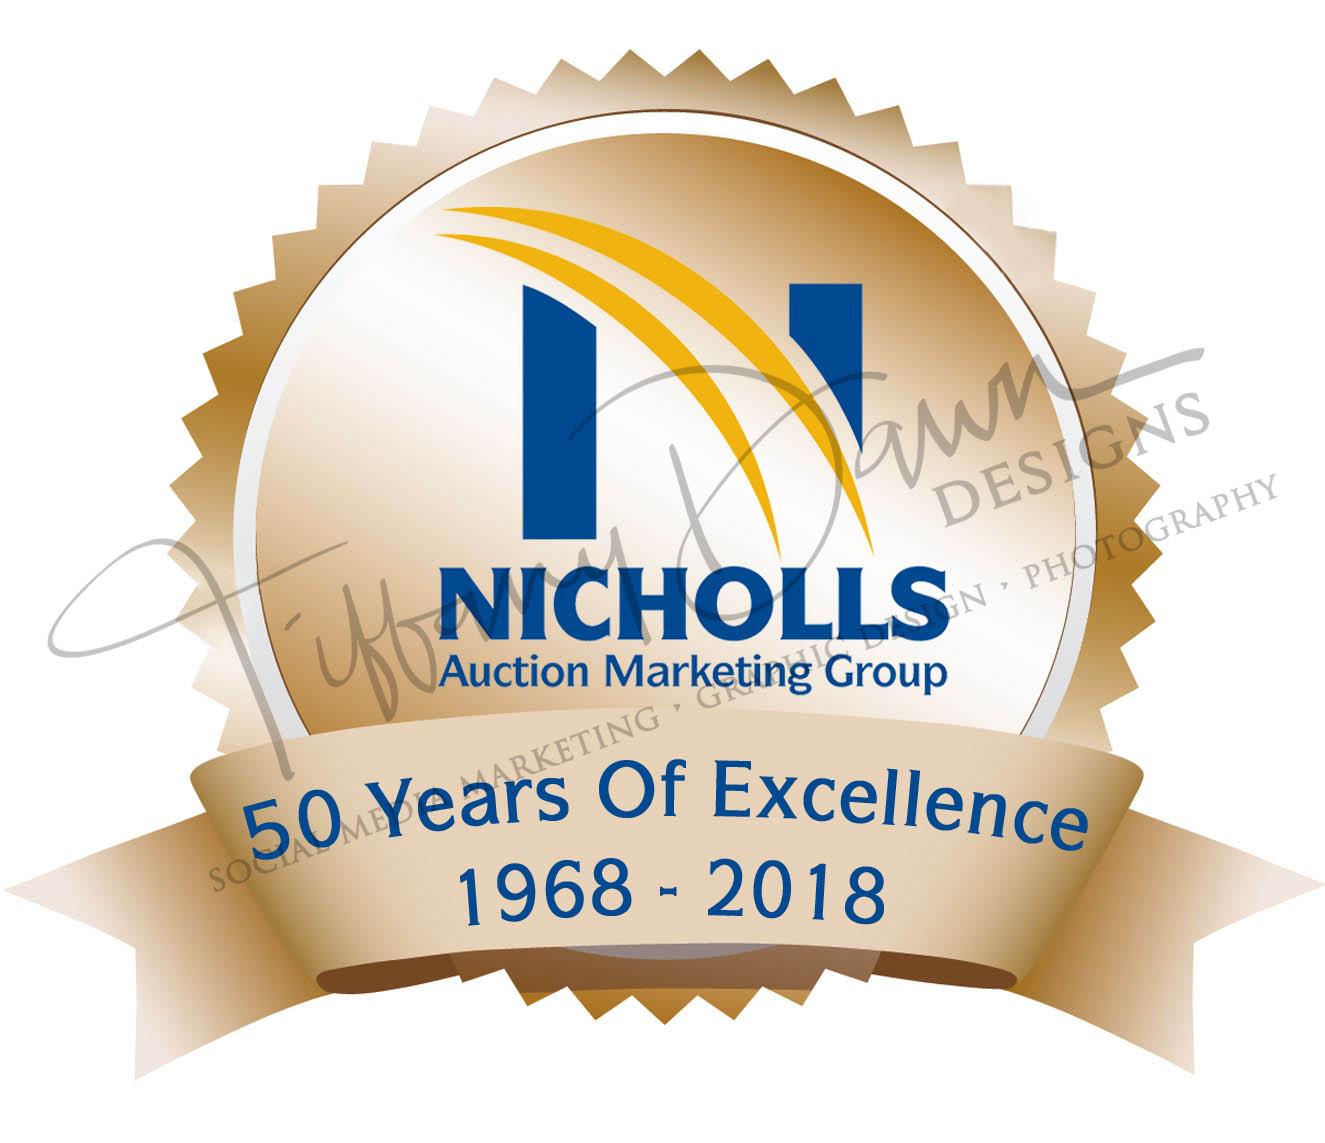 Nicholls Medallion